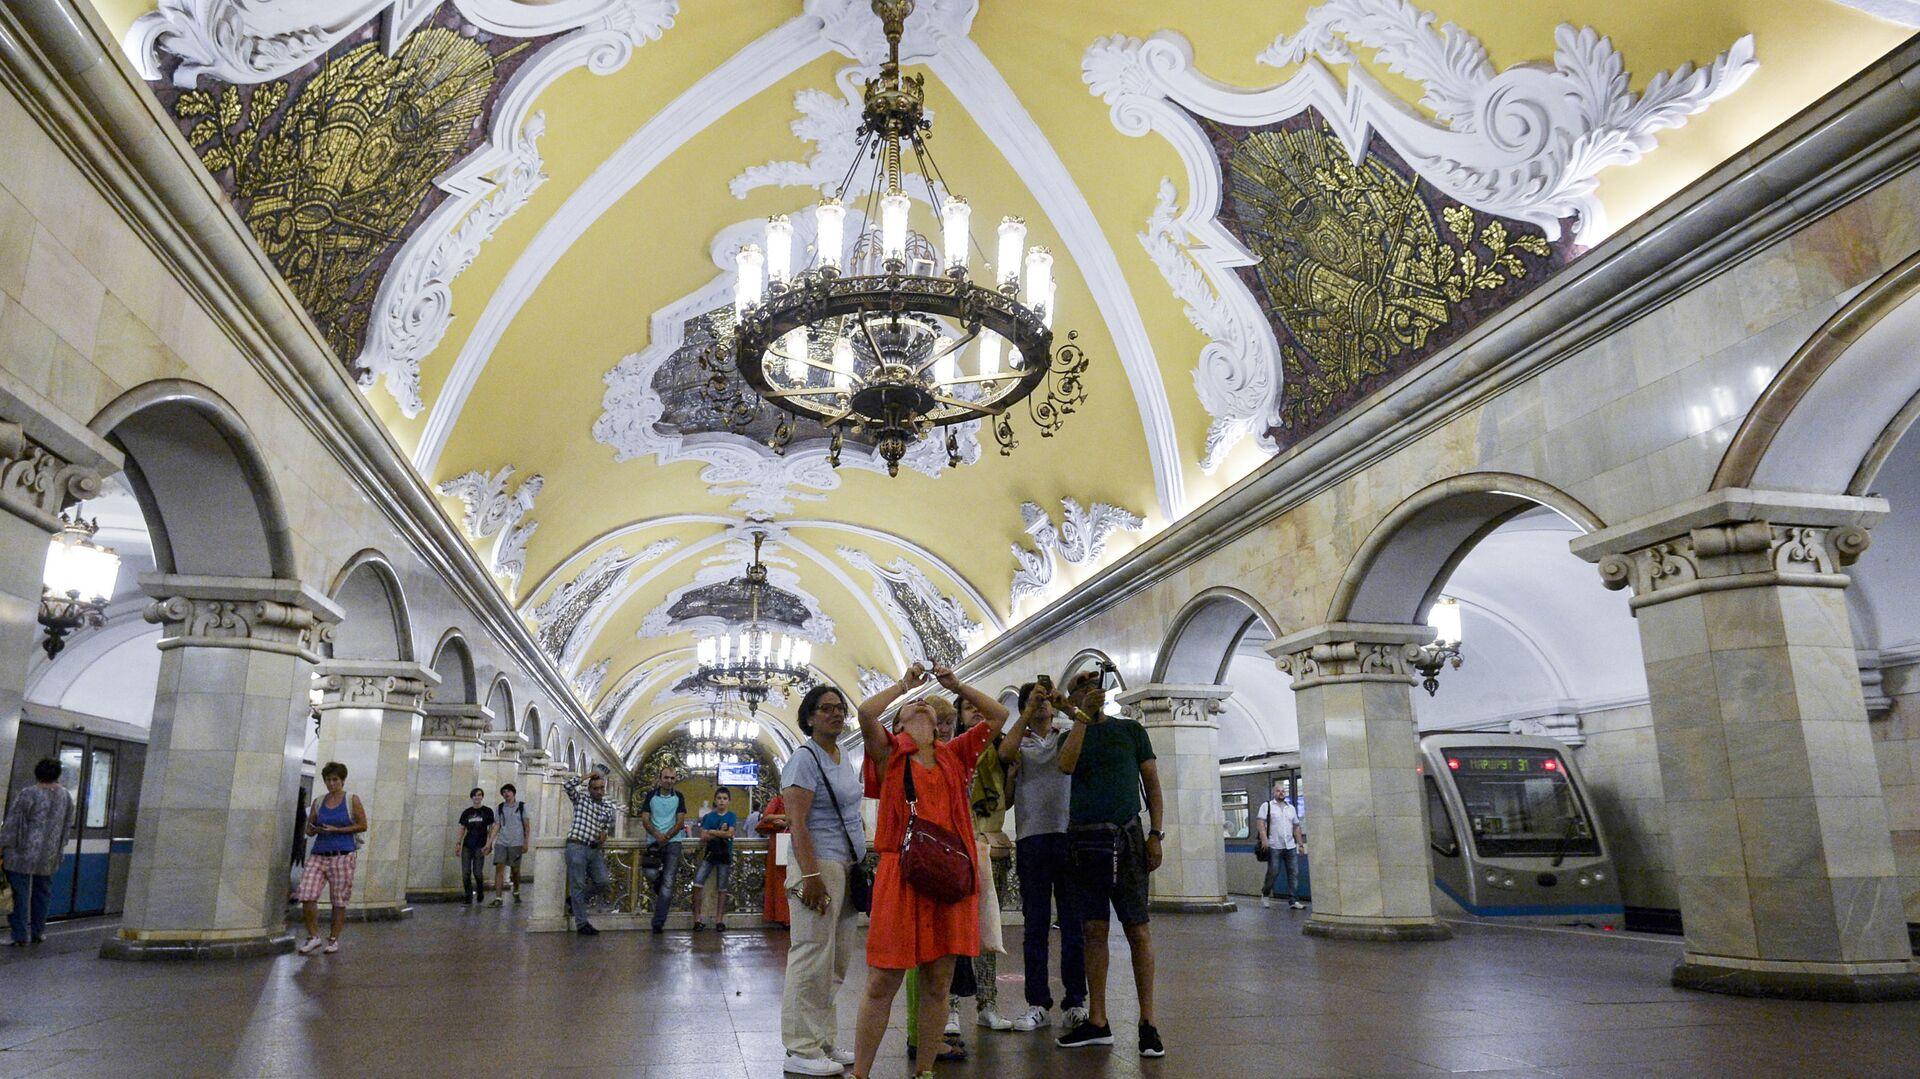 1527043423 0:151:3106:1898 1920x0 80 0 0 b65d43b1ae58f122d33735f73a6f9803 - Власти подсчитали, сколько туристов потеряла Москва из-за пандемии